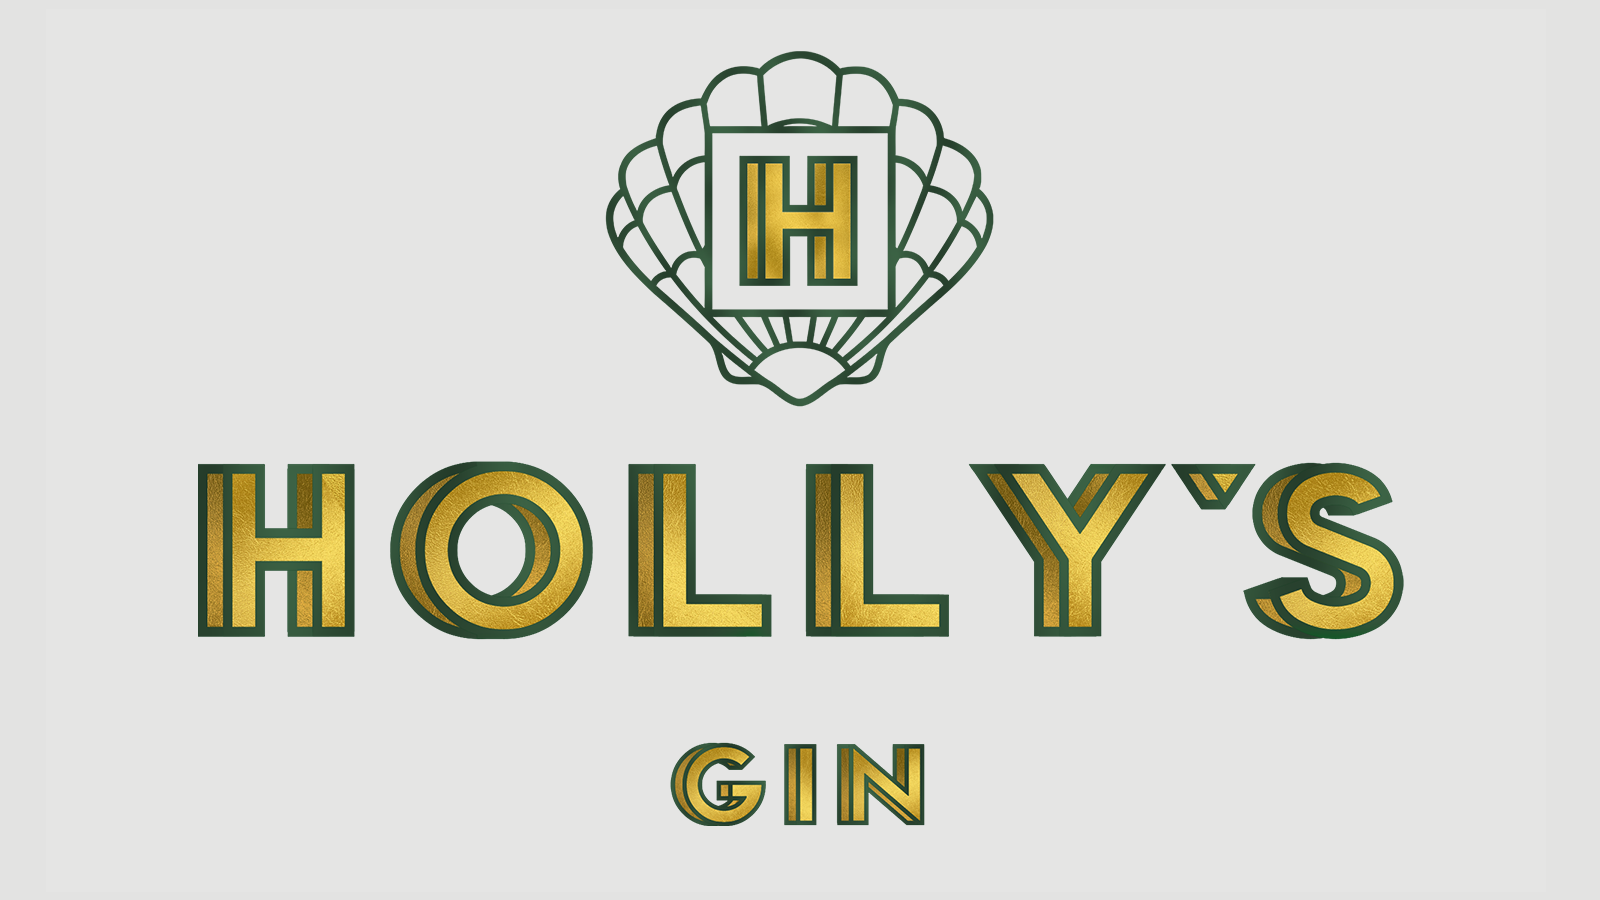 Holly's Gin